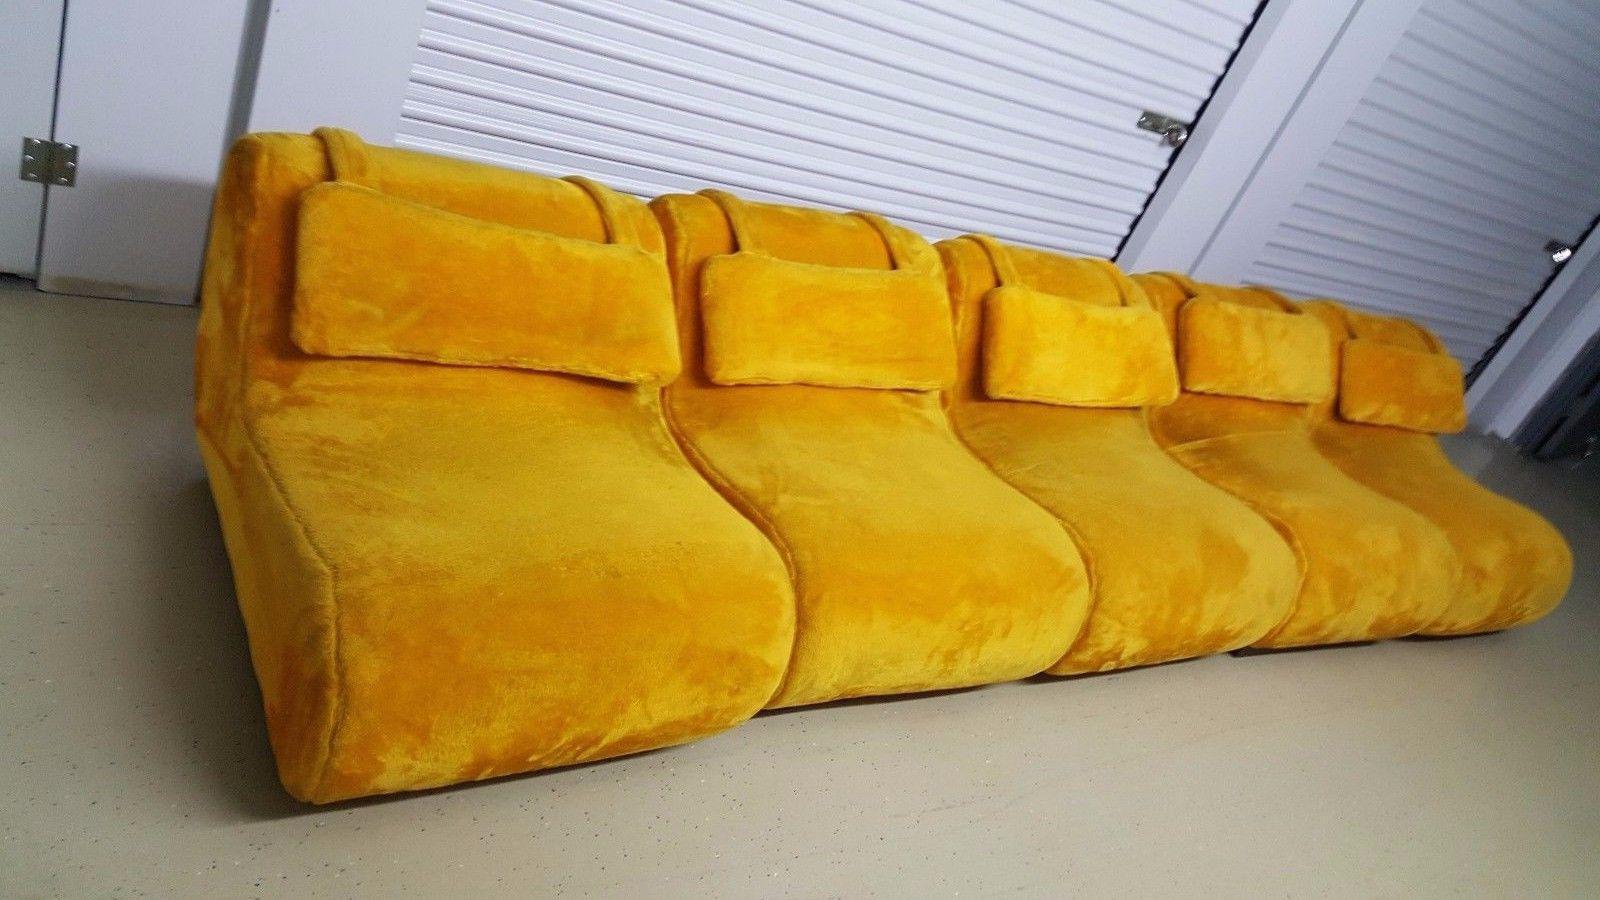 Carson Pirie Scott Furniture Wilmette Best Image Middleburgarts Org